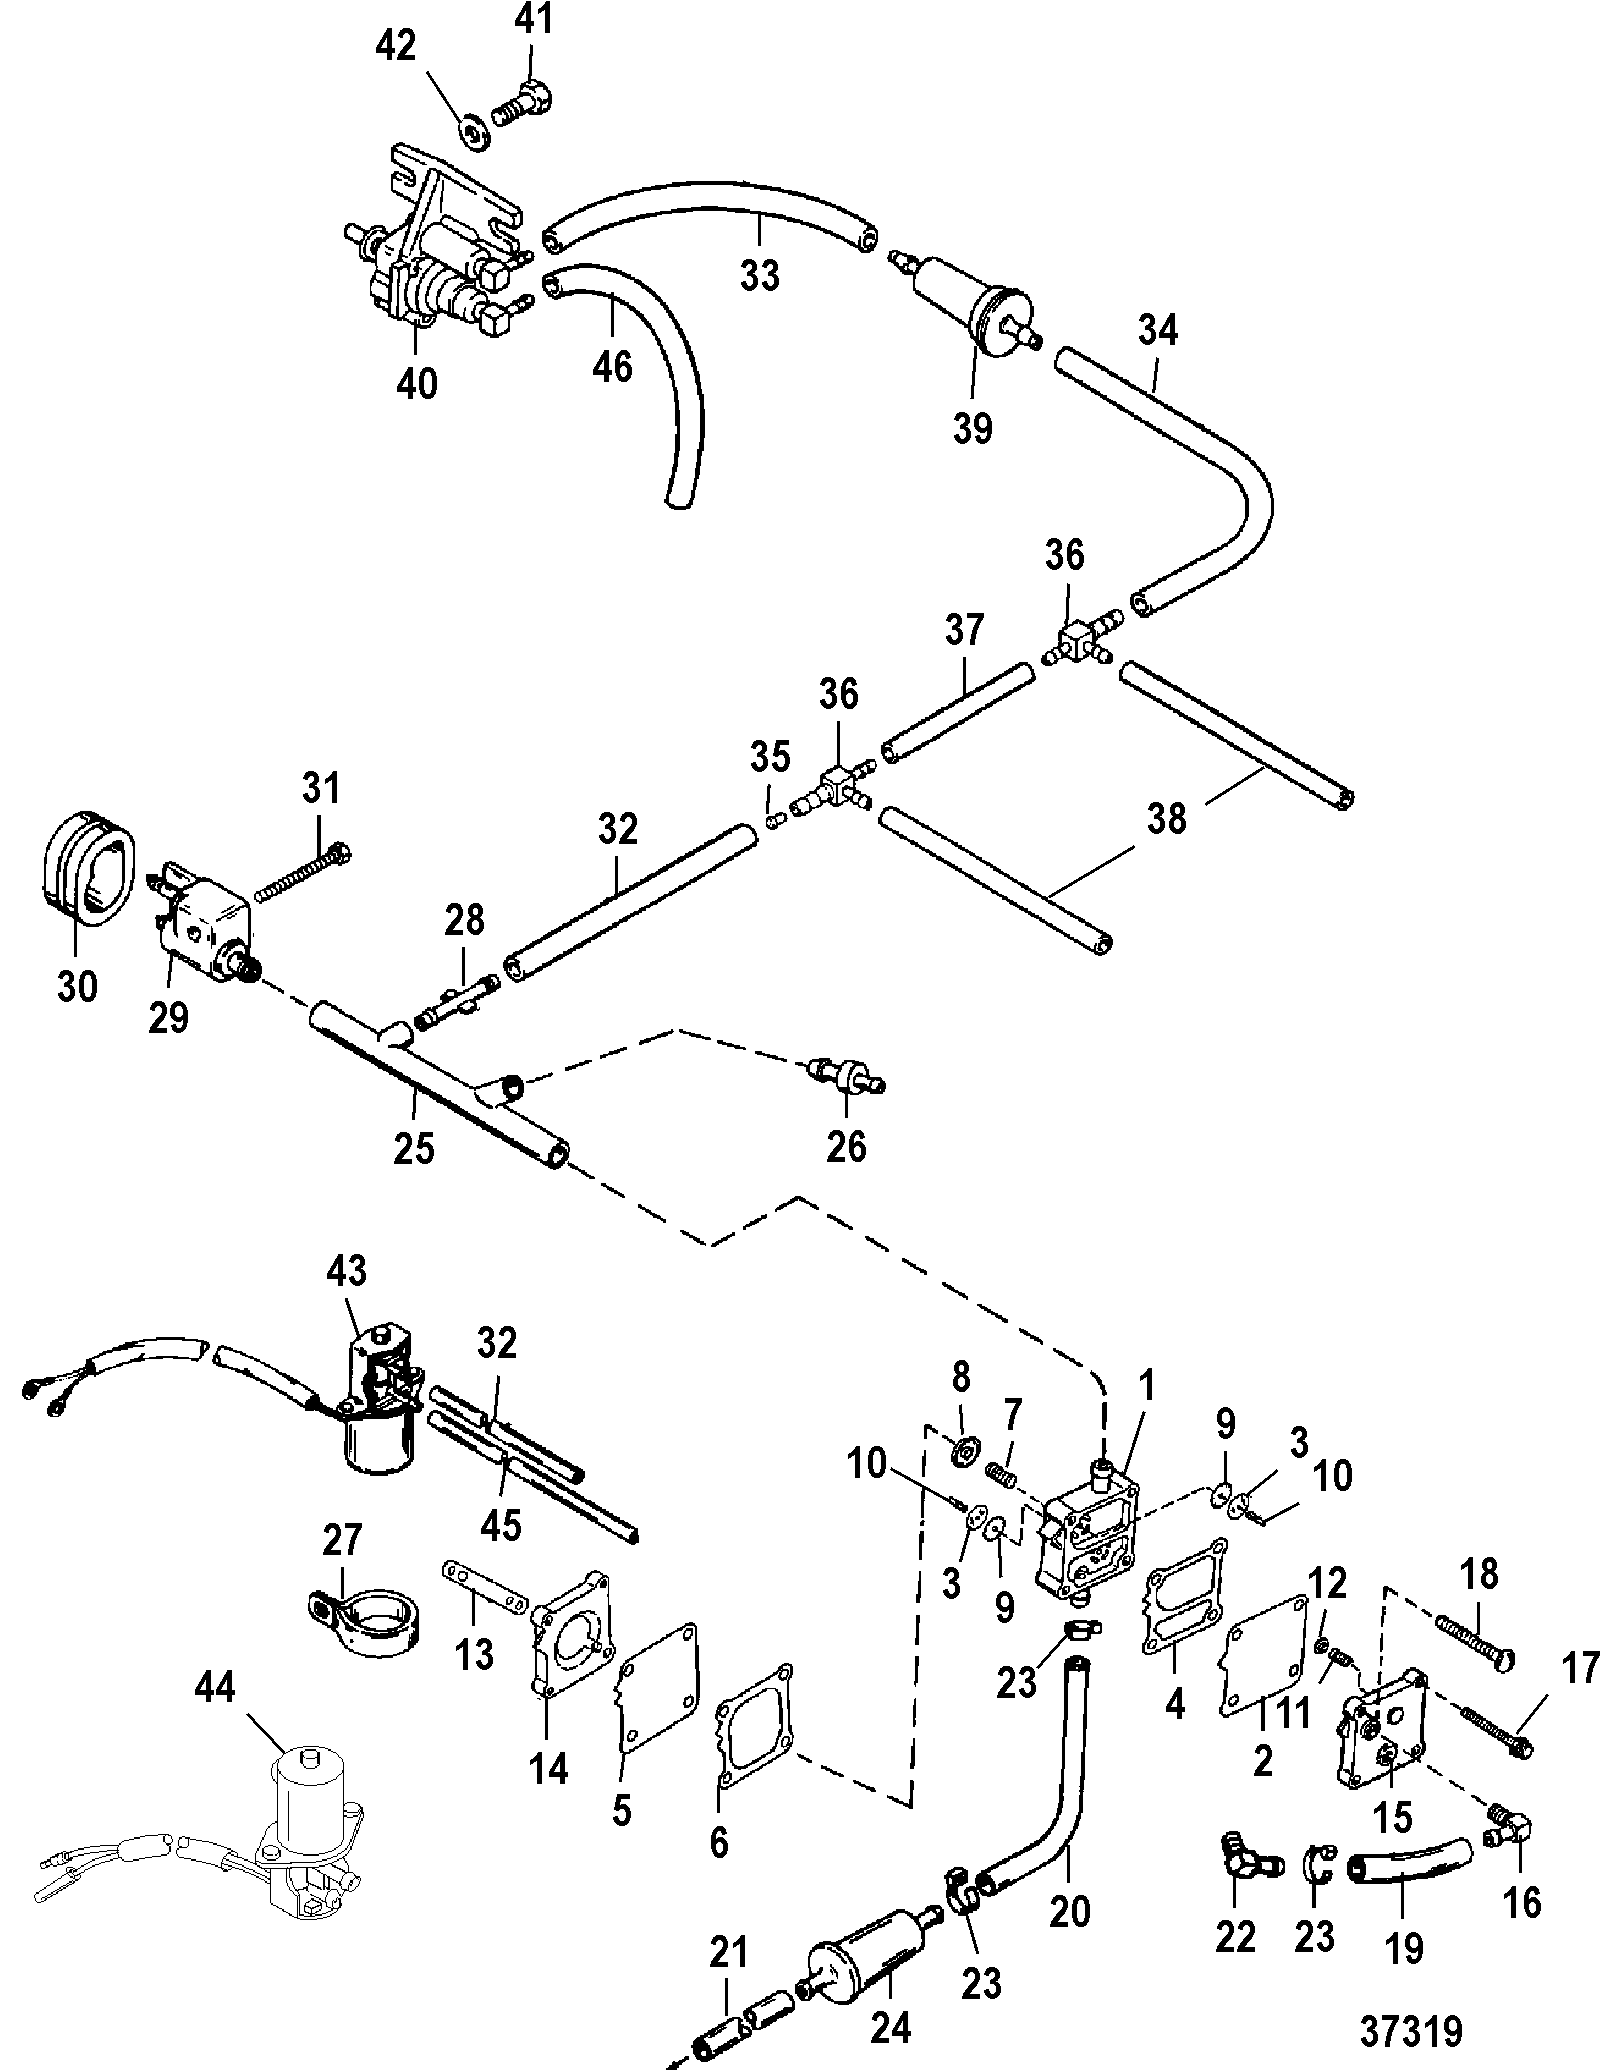 tags: #evinrude outboard fuel pump#2001 evinrude 90 fuel pump#evinrude 70  fuel pump#suzuki outboard engine wiring diagram#outboard fuel pump diagram# johnson